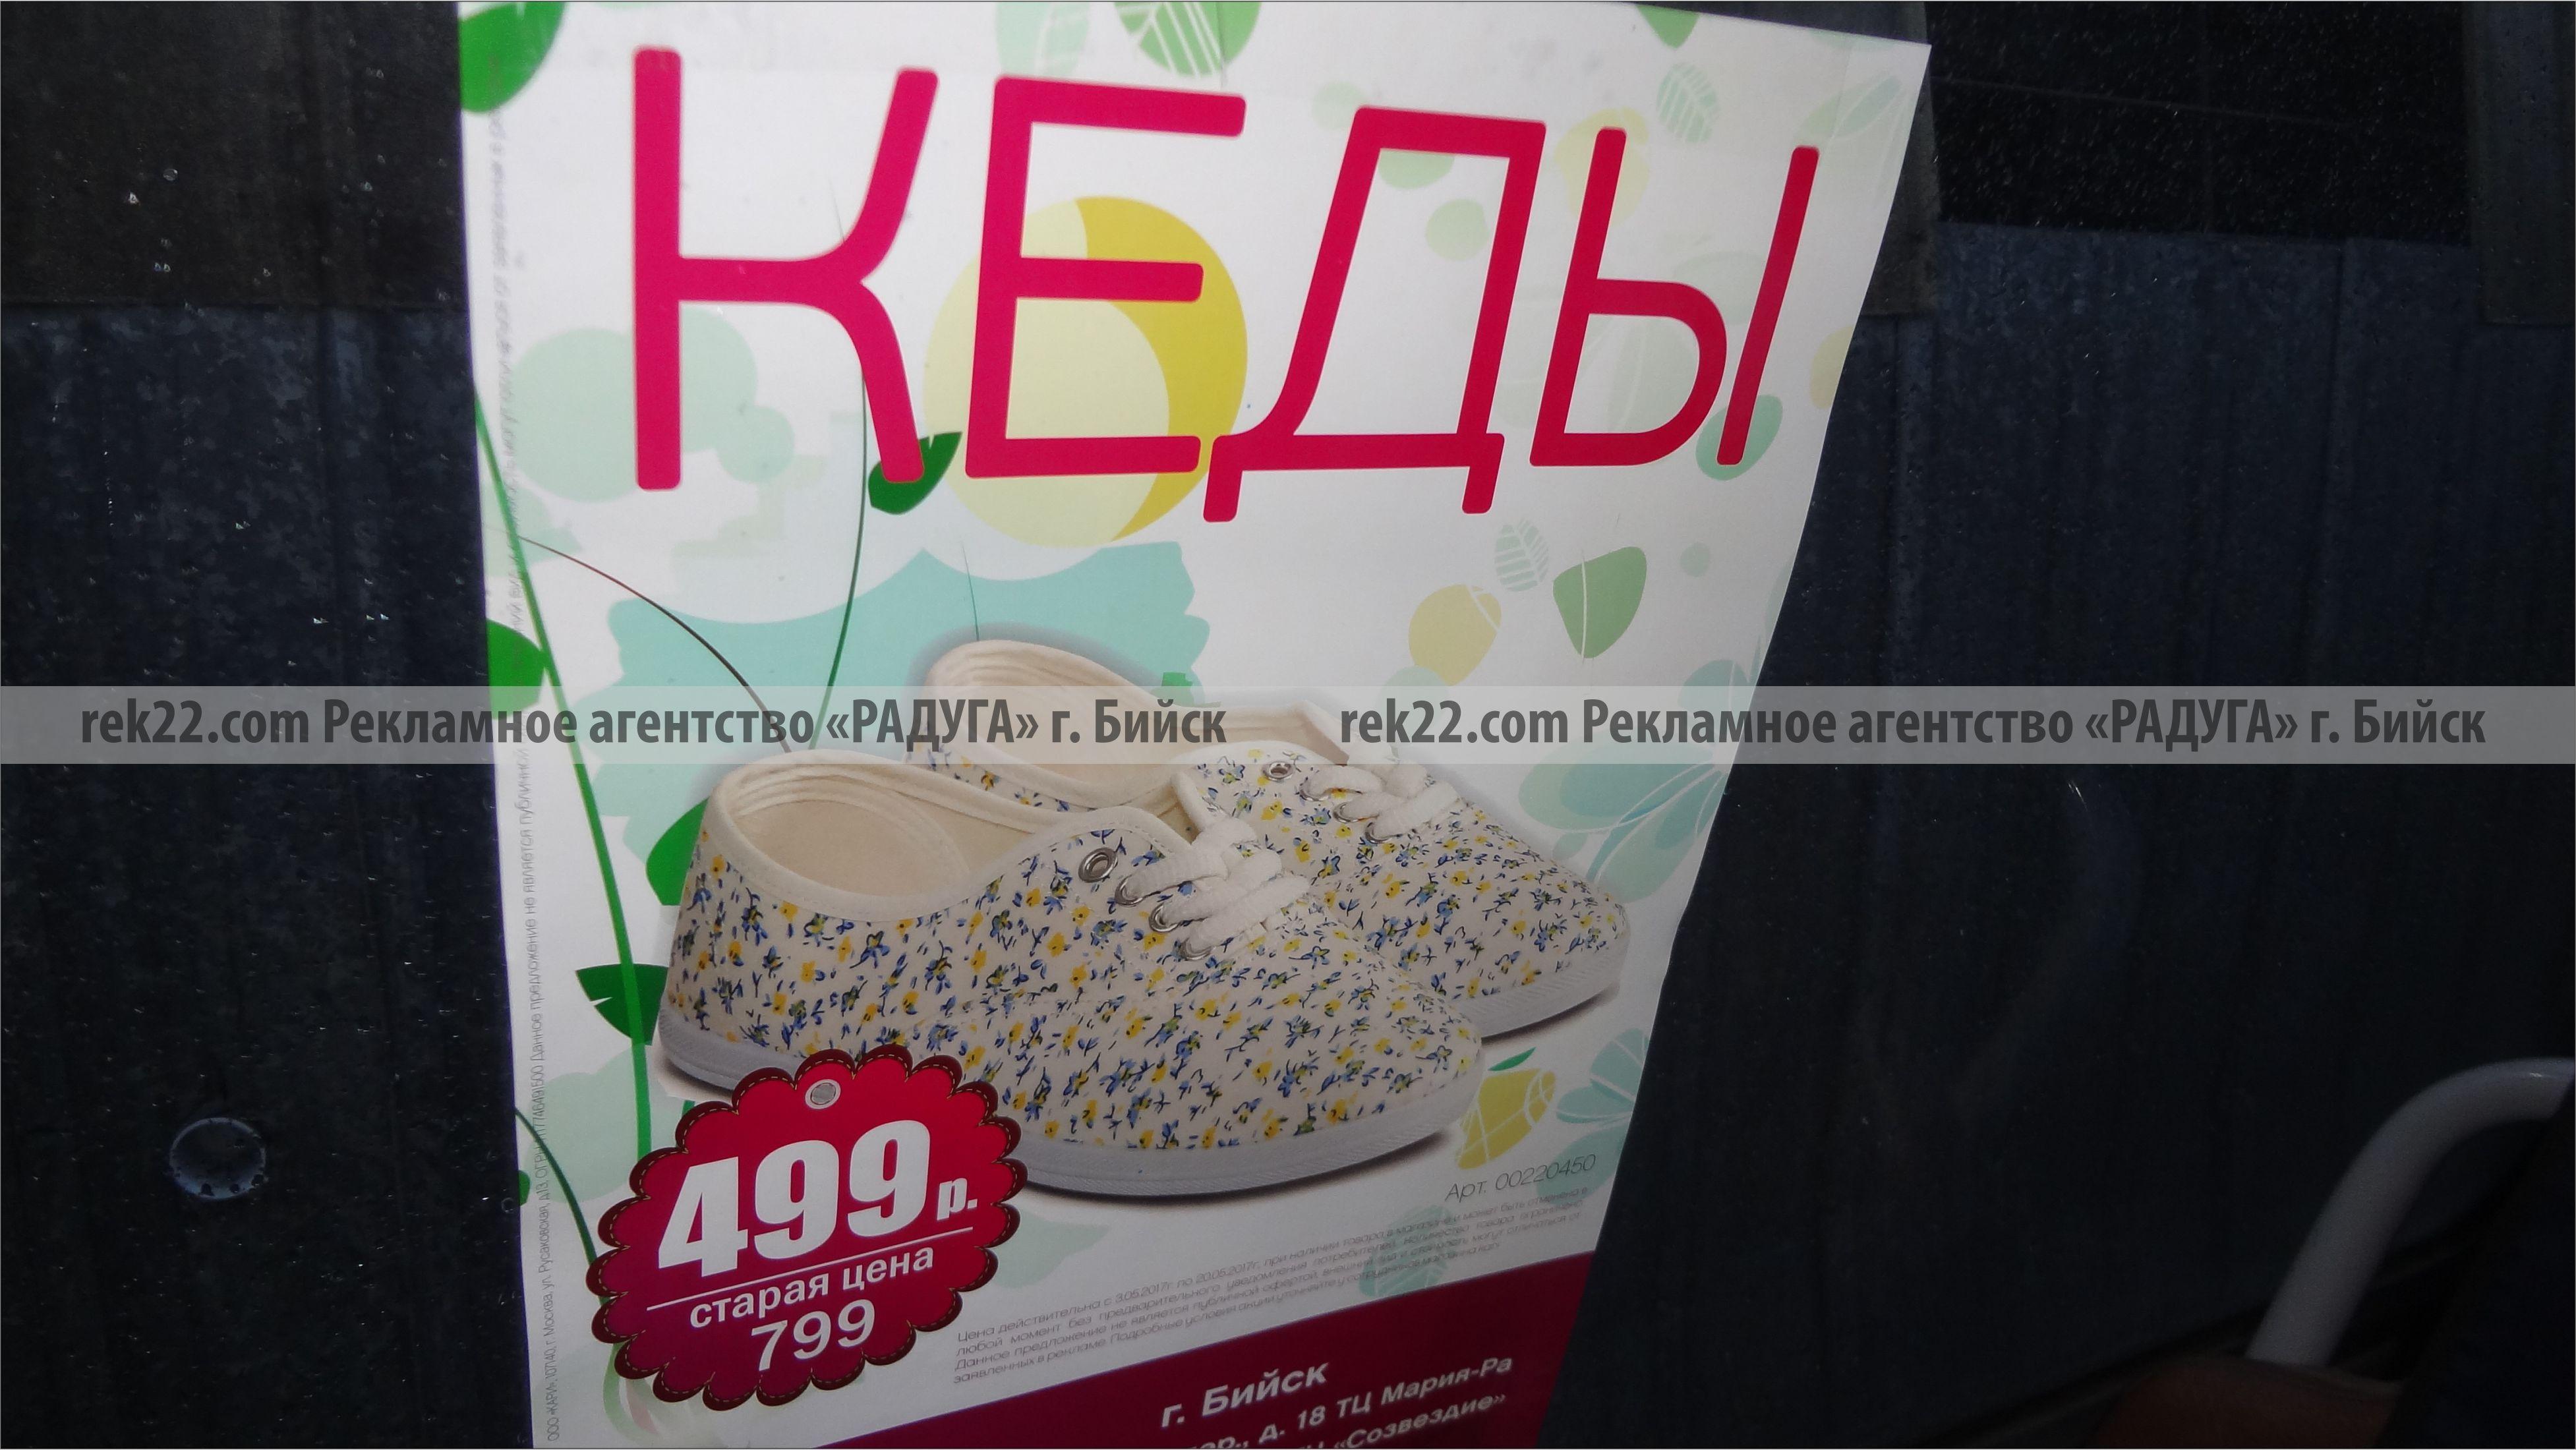 Реклама на транспорте Бийск - листовки - 8